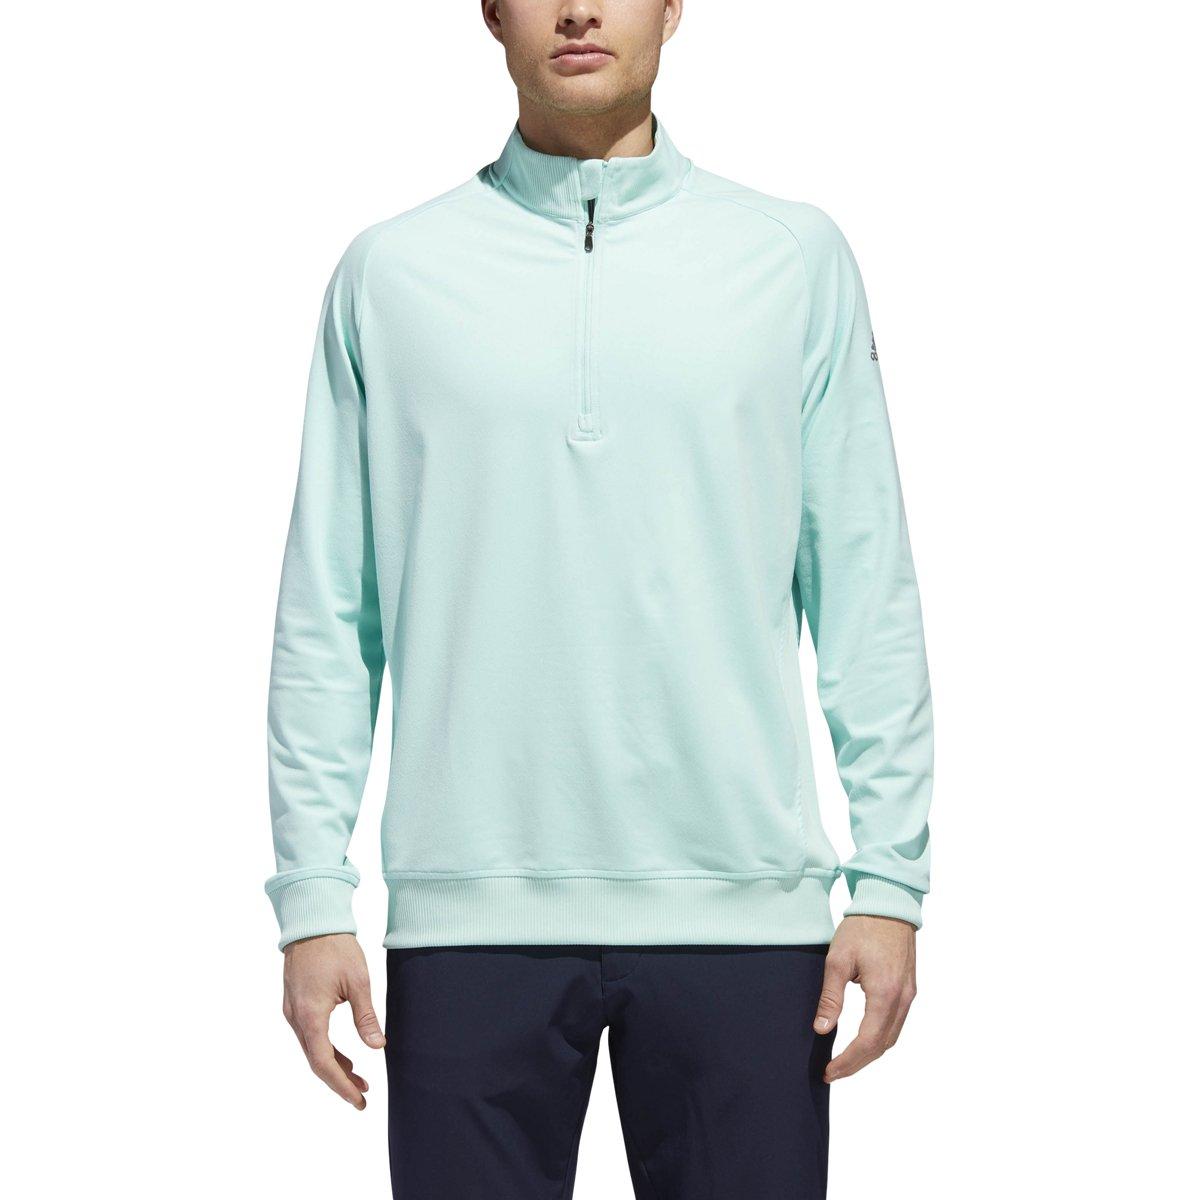 adidas Golf Men's Classic Club 1/4 Zip Pullover Sweater, Small, Clear Mint F